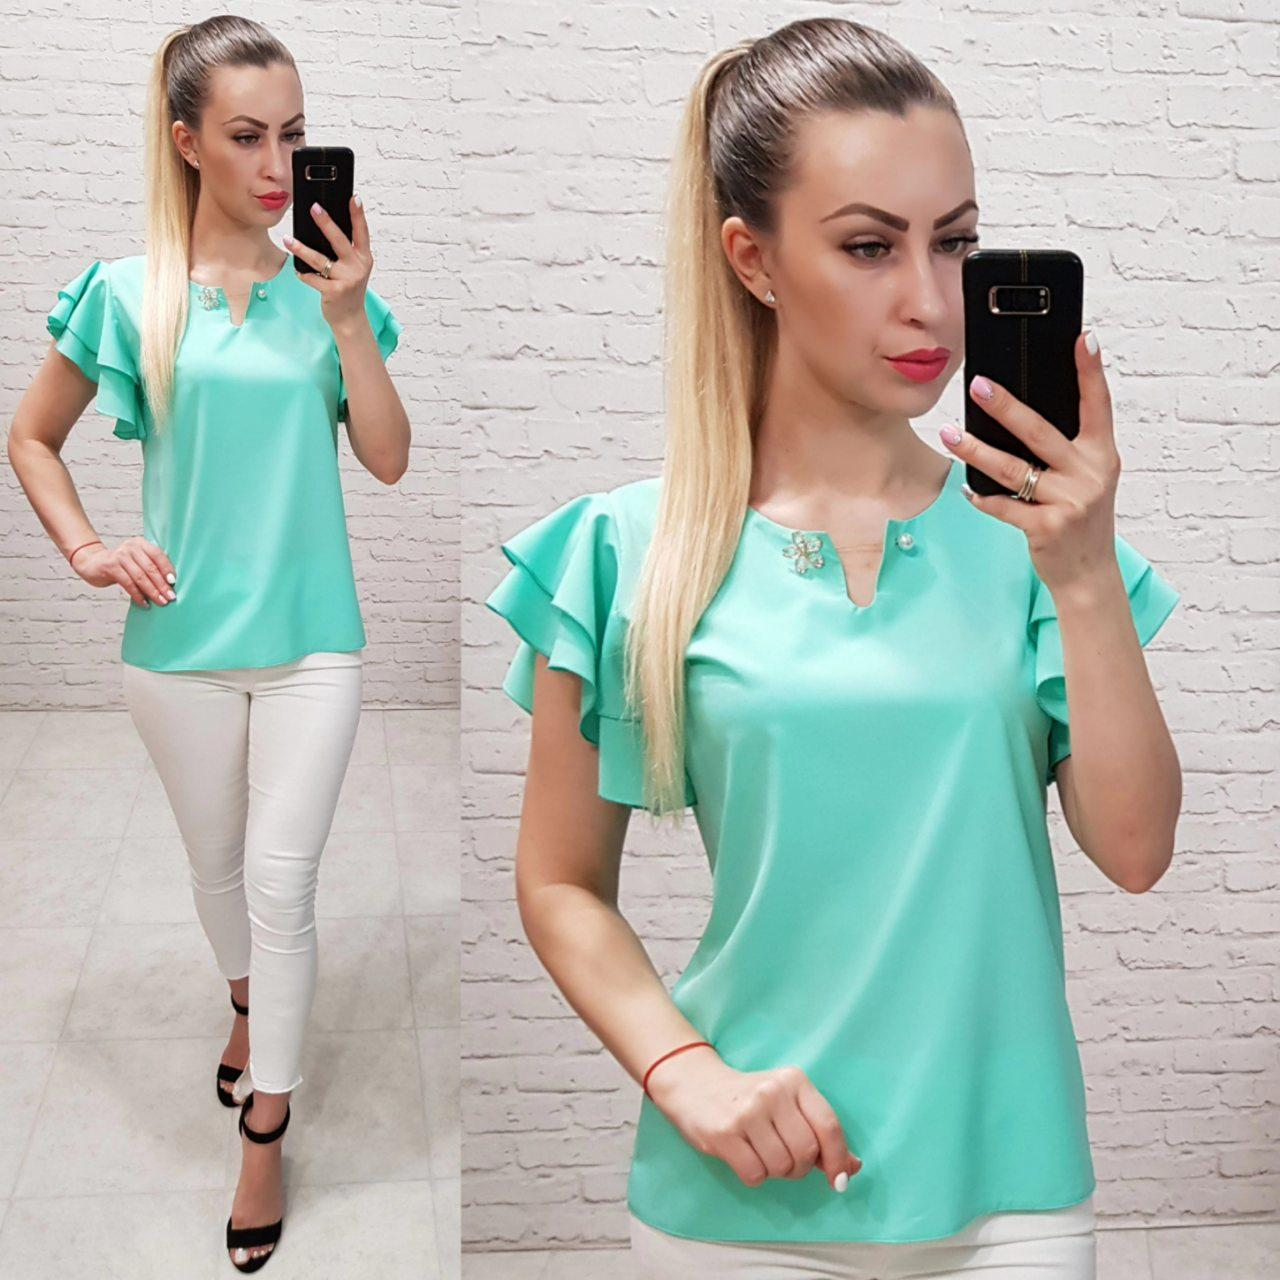 Блузка / блуза короткий рукав с брошью арт. 166 мятная / бирюзовая